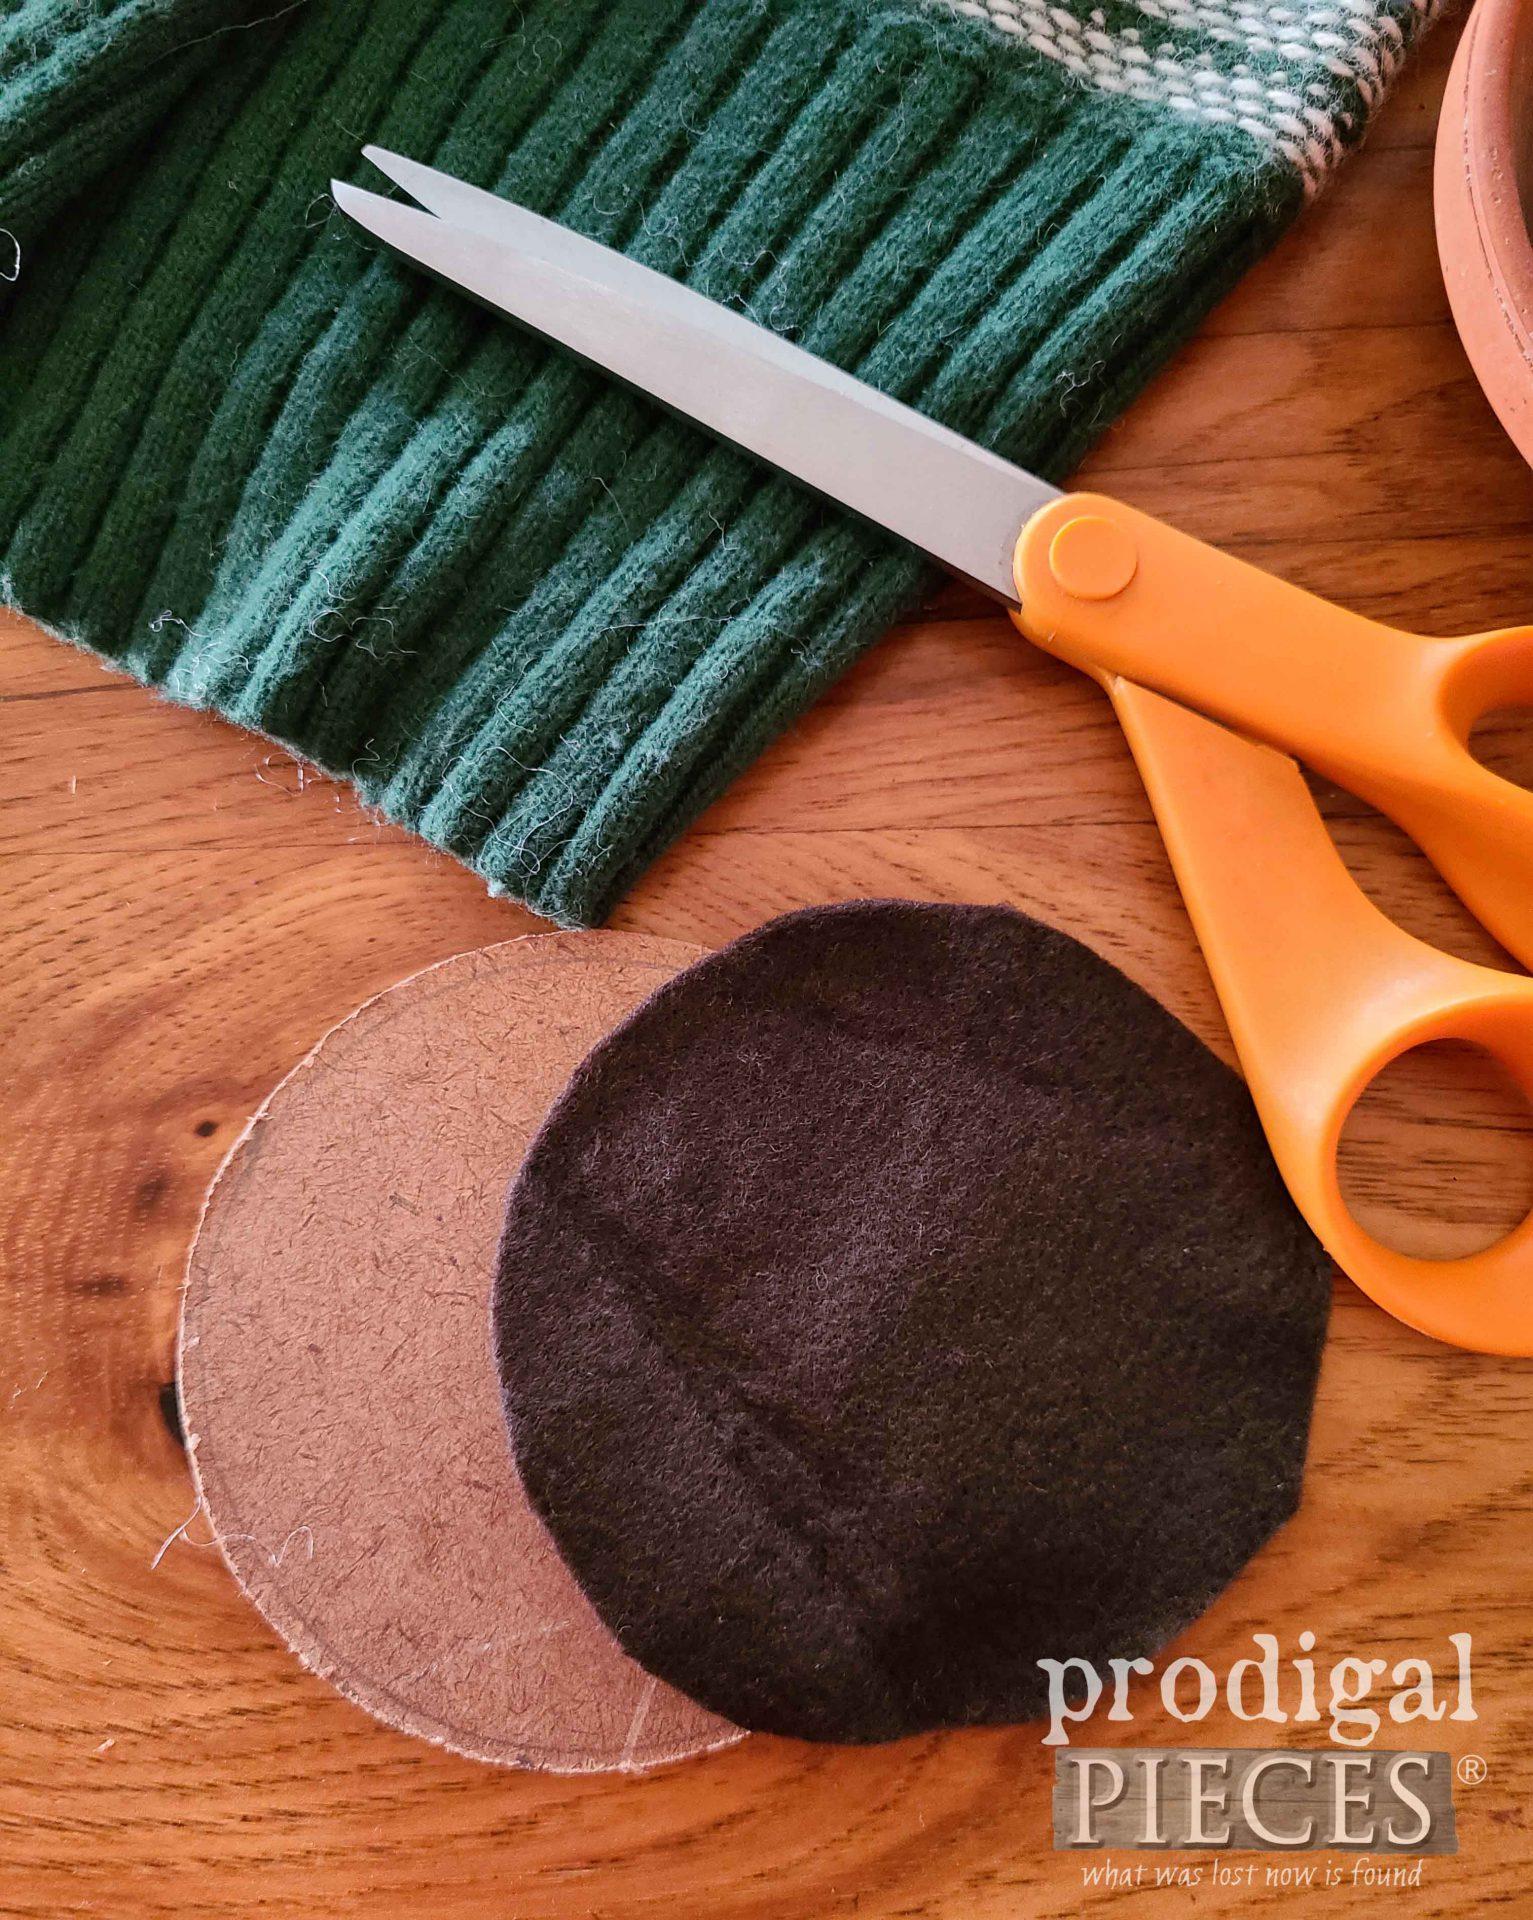 Pincushion Inserts of Hard Board and Felt | prodigalpieces.com